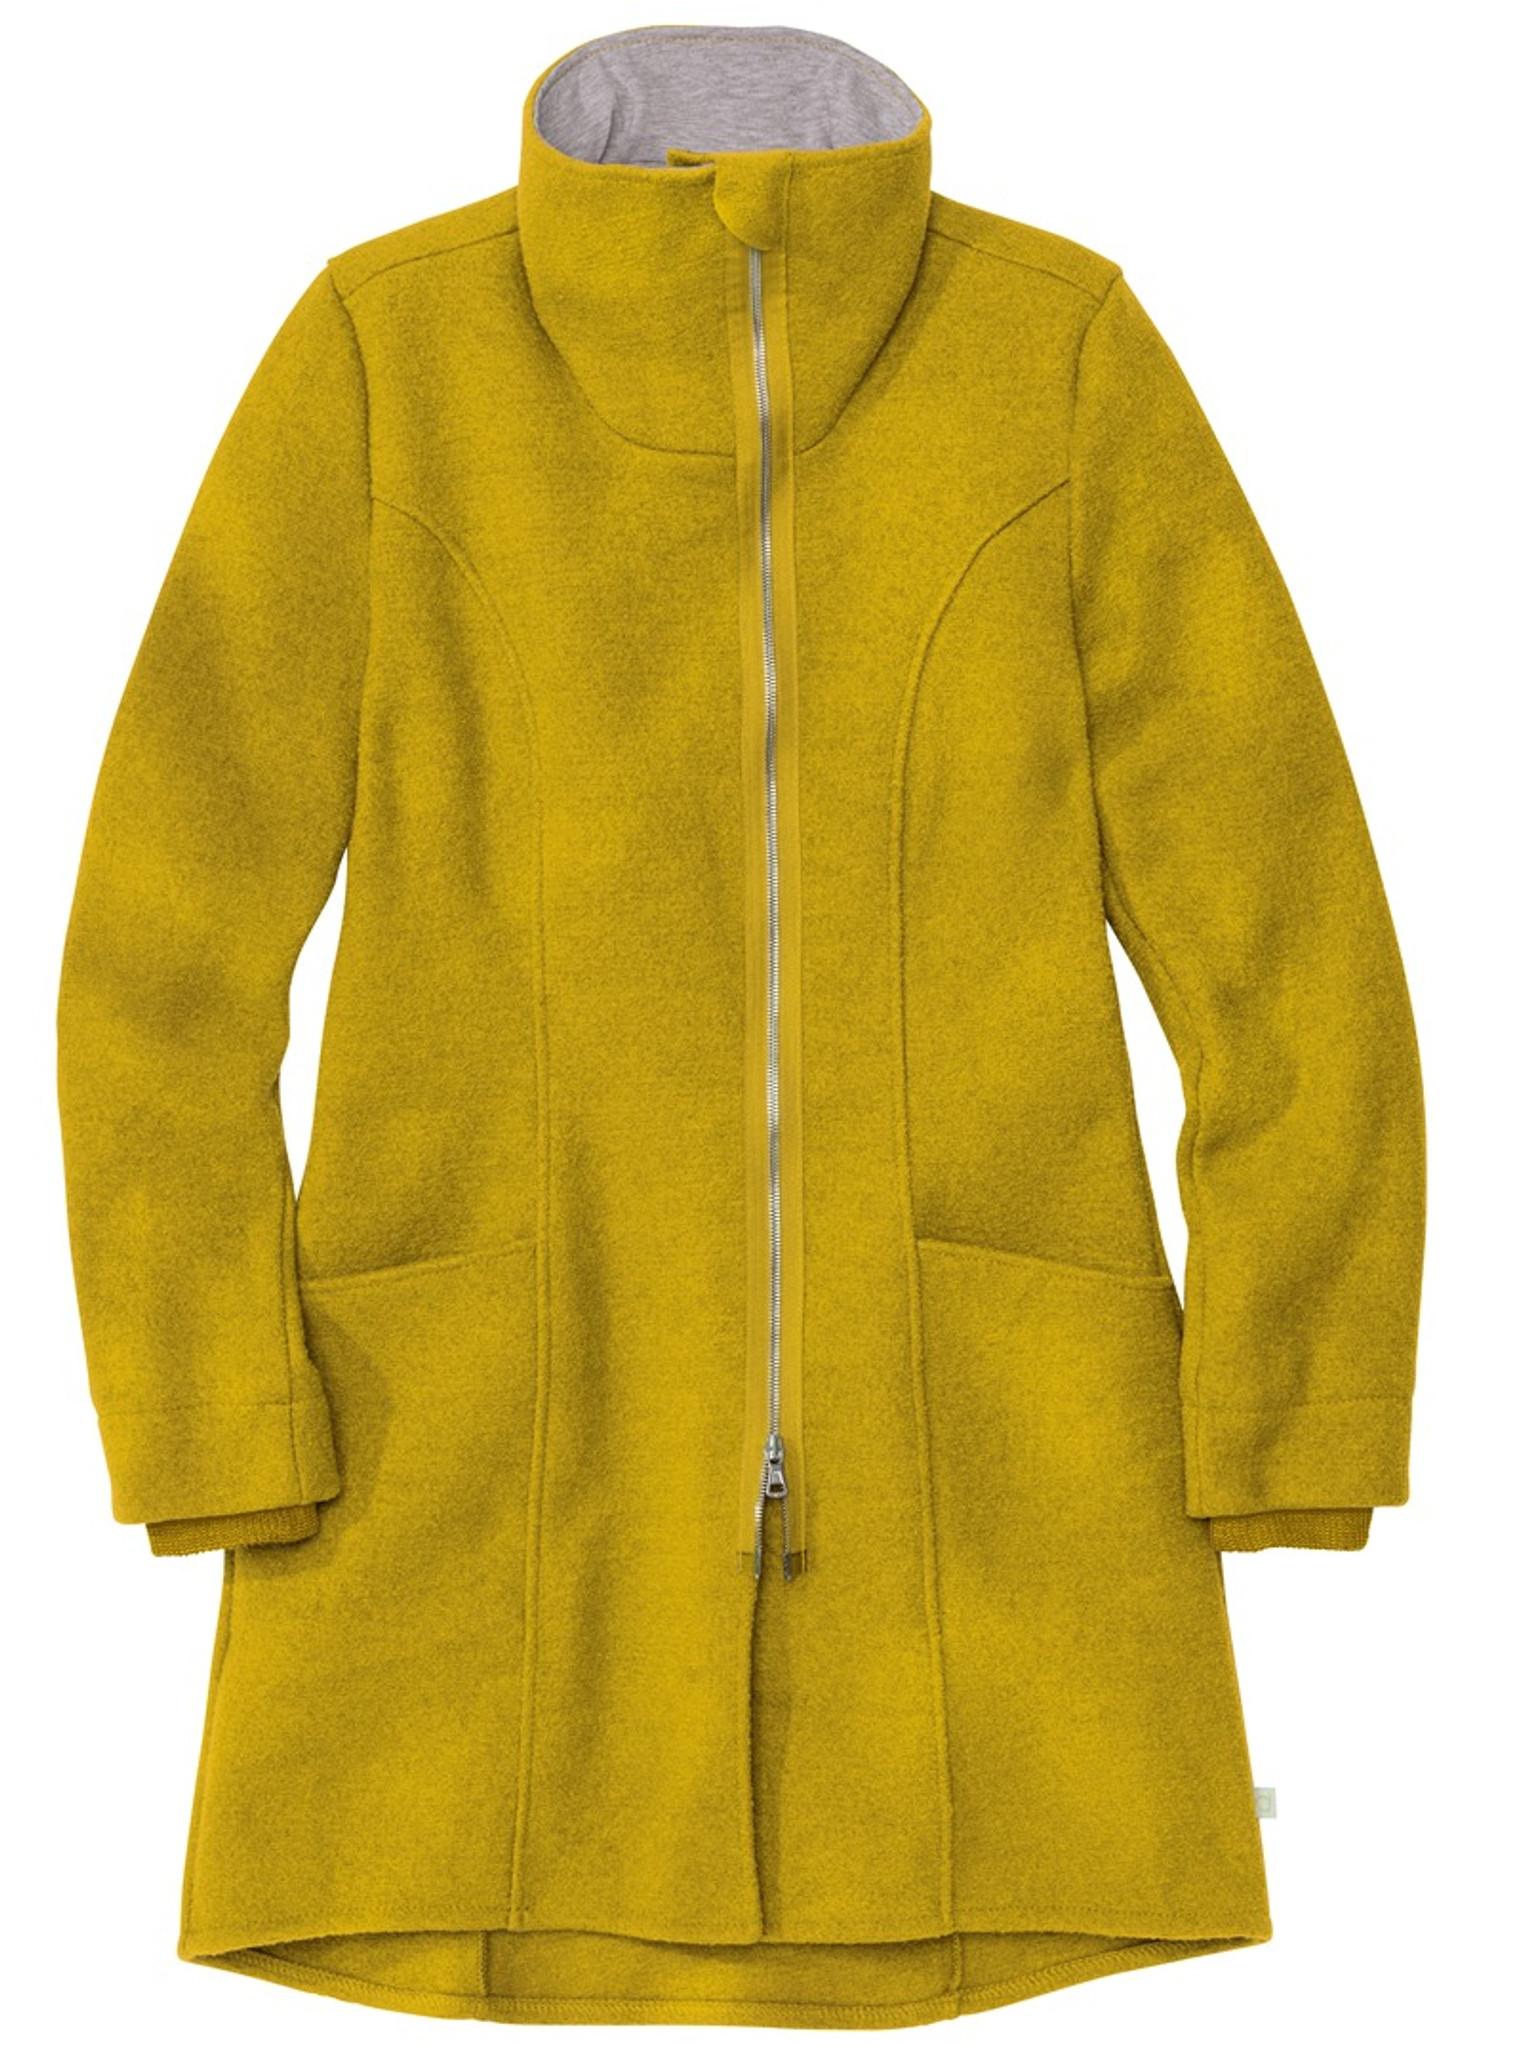 new arrivals b4e76 ac2d9 Disana Organic Boiled Wool Women's Coat - Little Spruce Organics